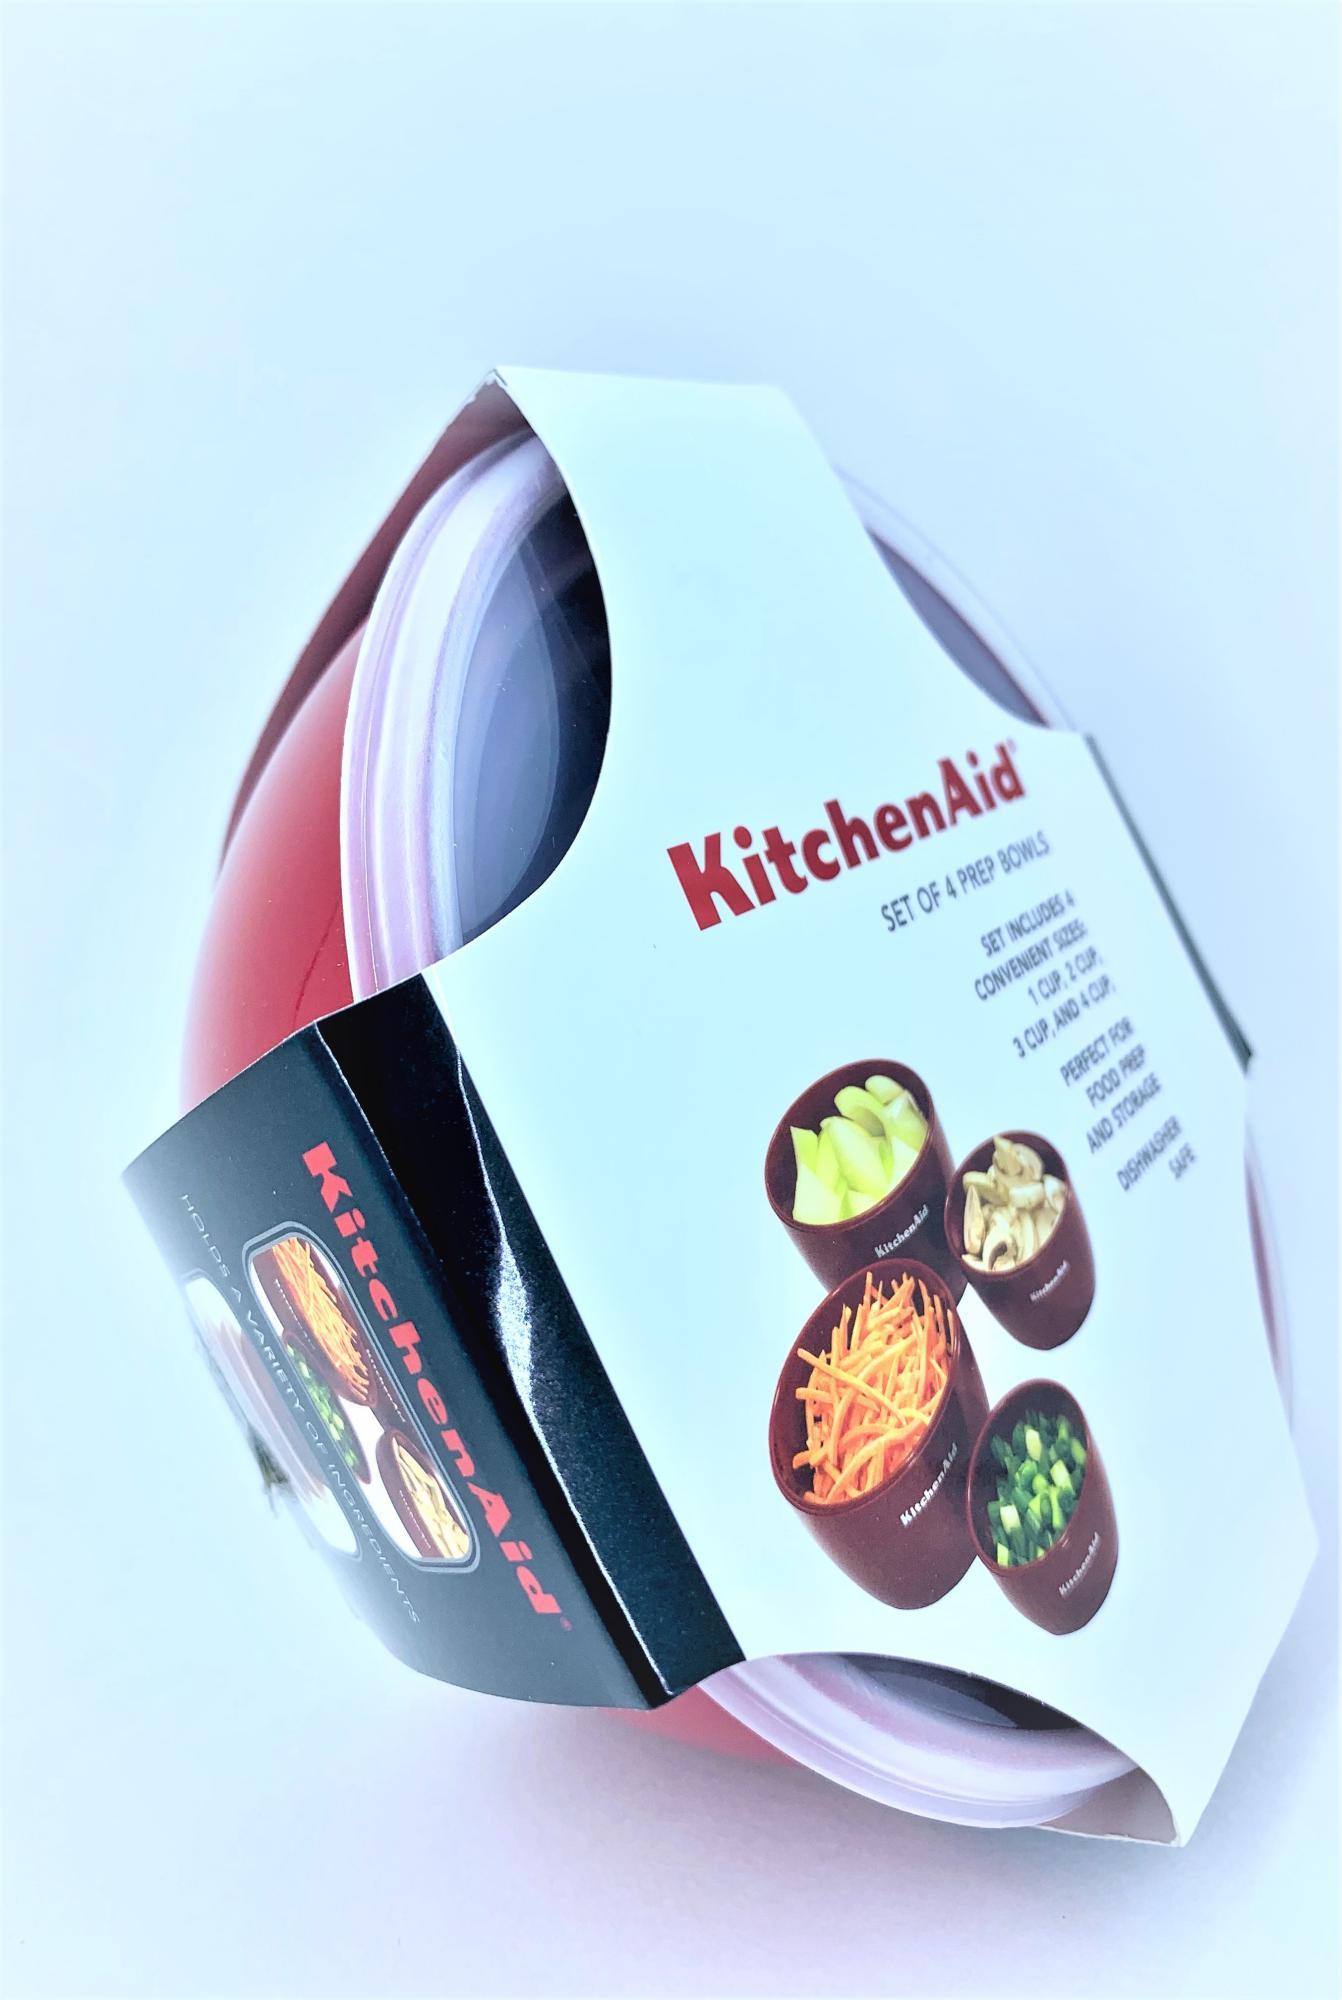 Kit Tigelas Potes 4 peças Vermelho KitchenAid